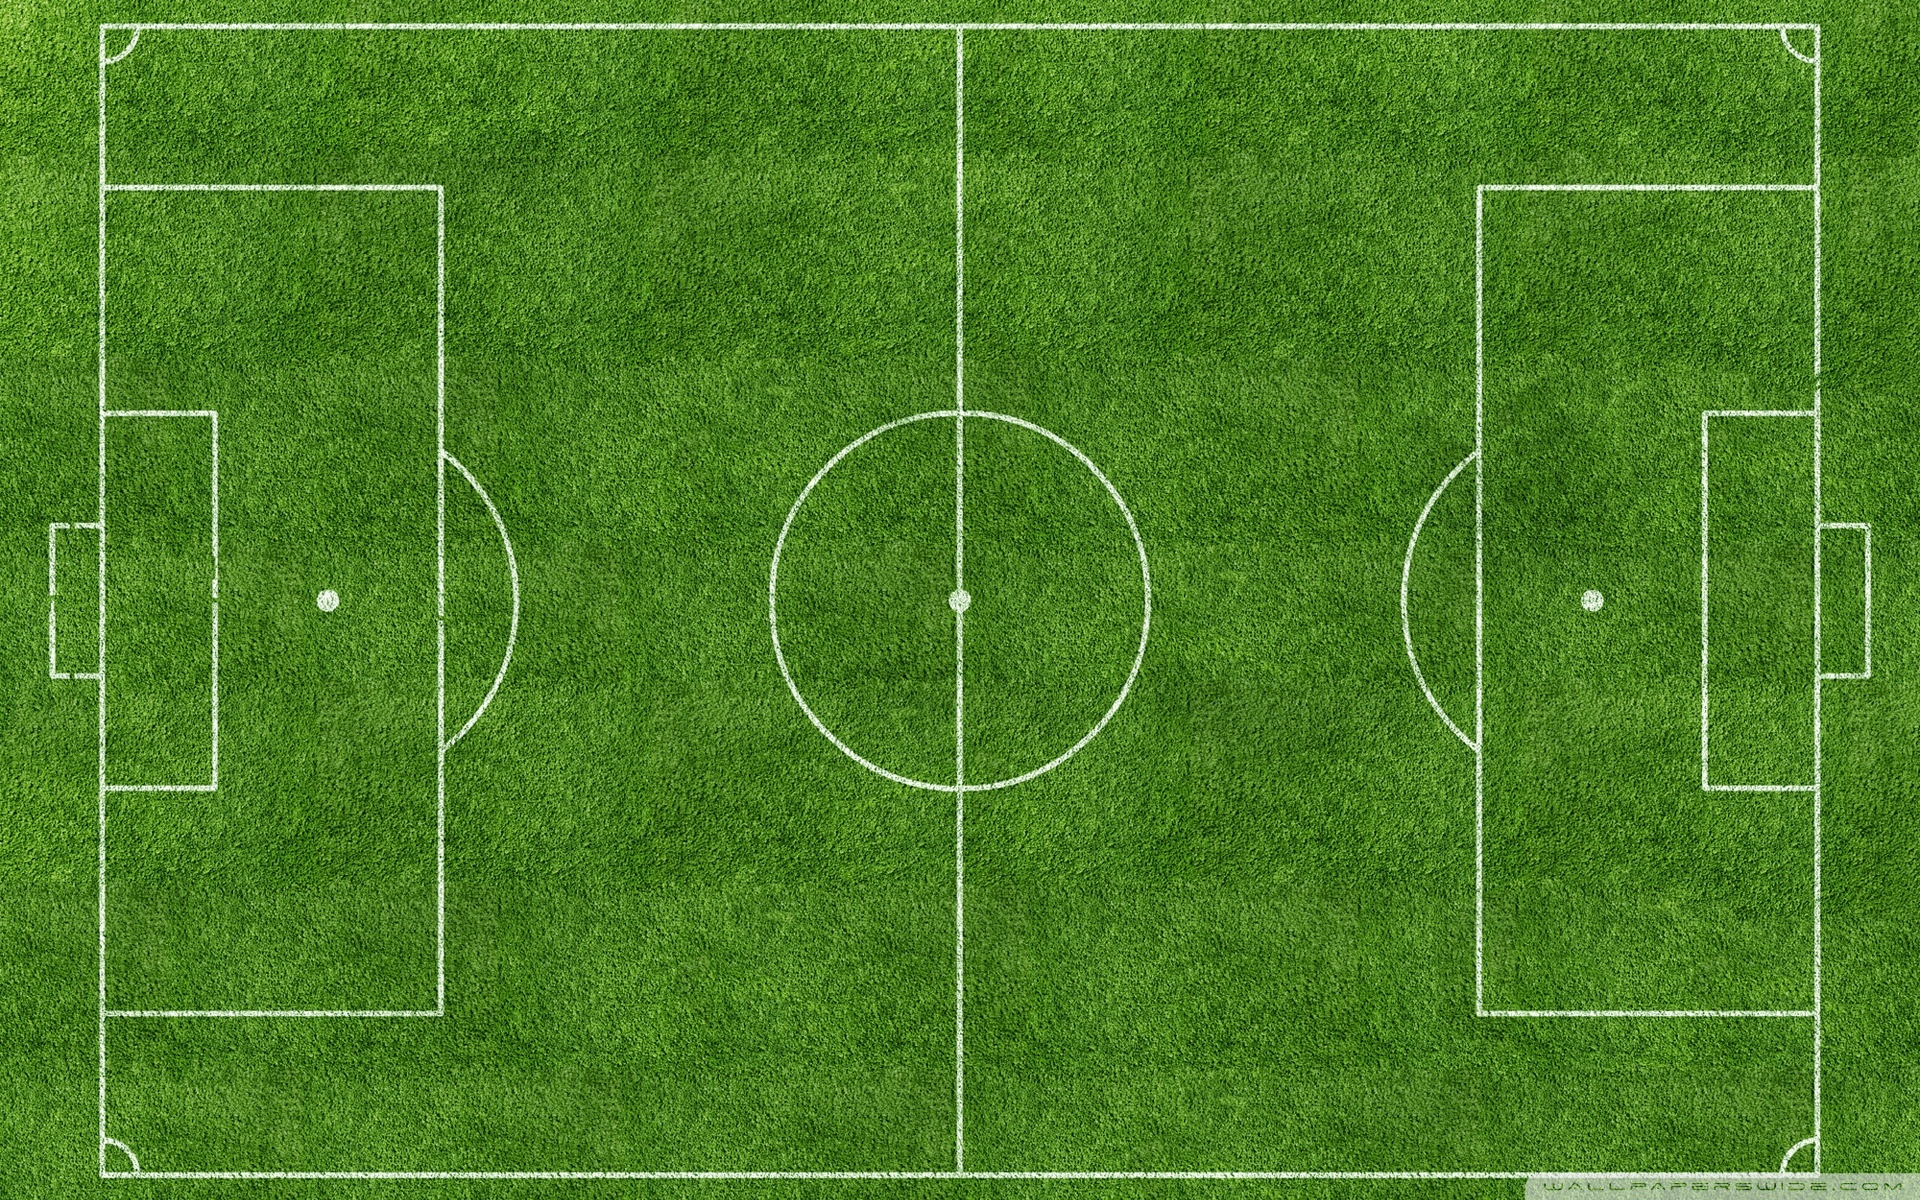 Cartoon Football Pitch.